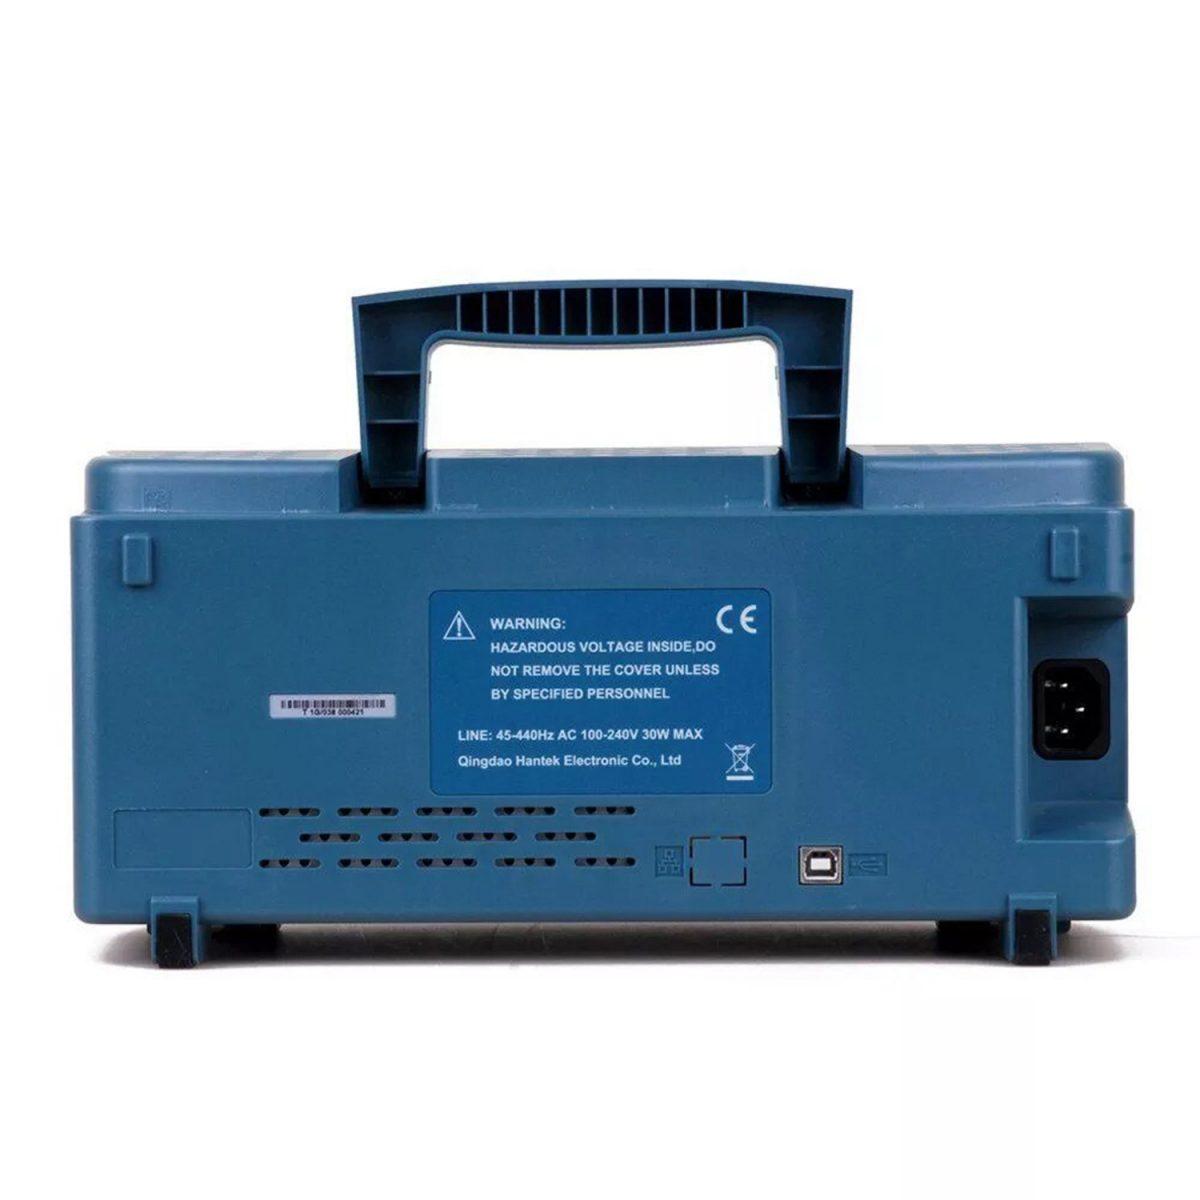 اسیلوسکوپ دیجیتال هنتک Hantek DSO5202P